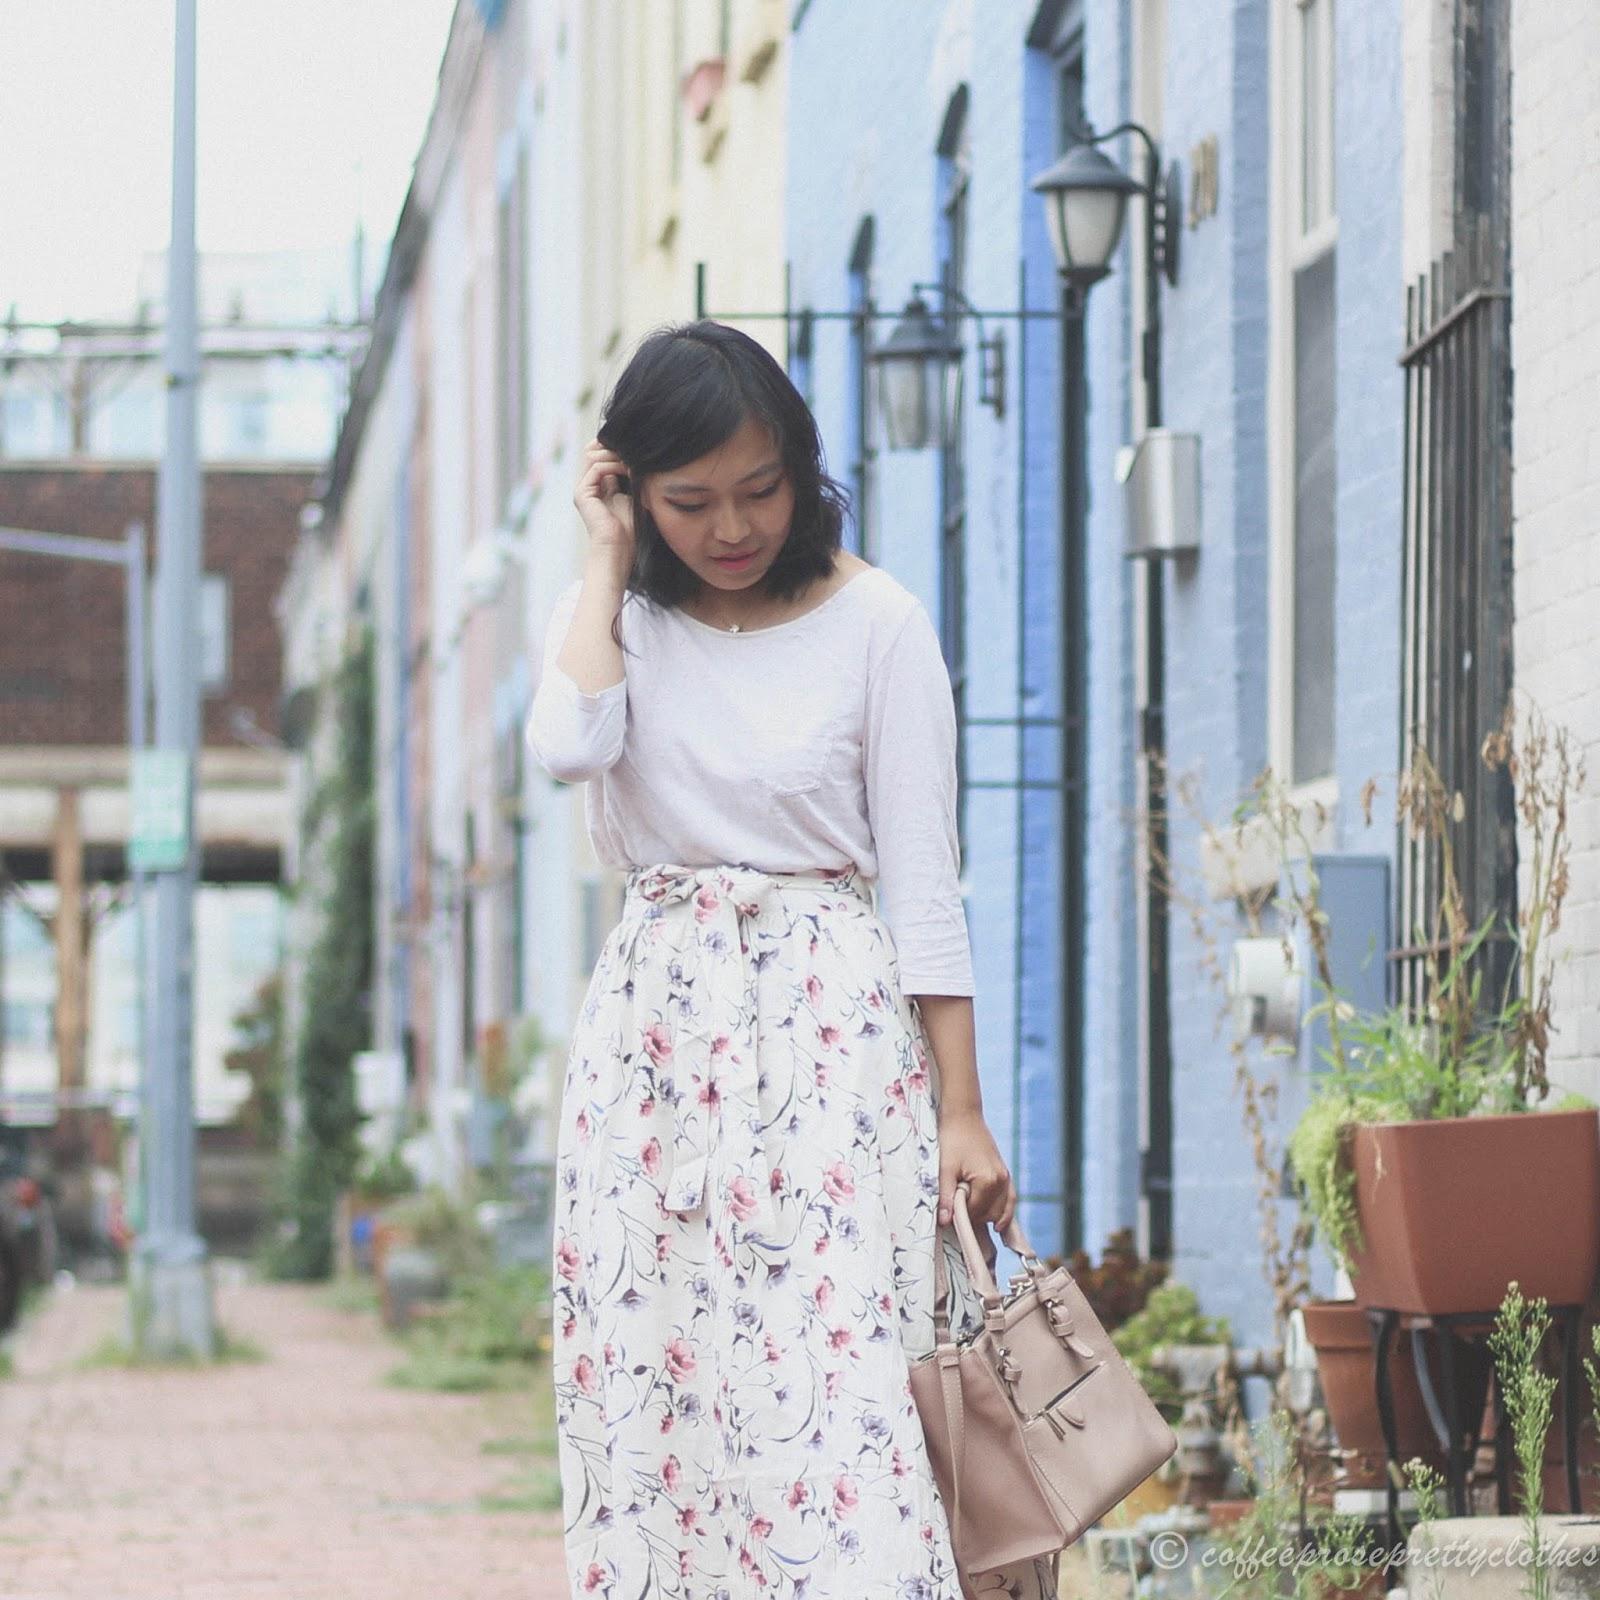 Floral midi skirt, espadrille wedges, vintage